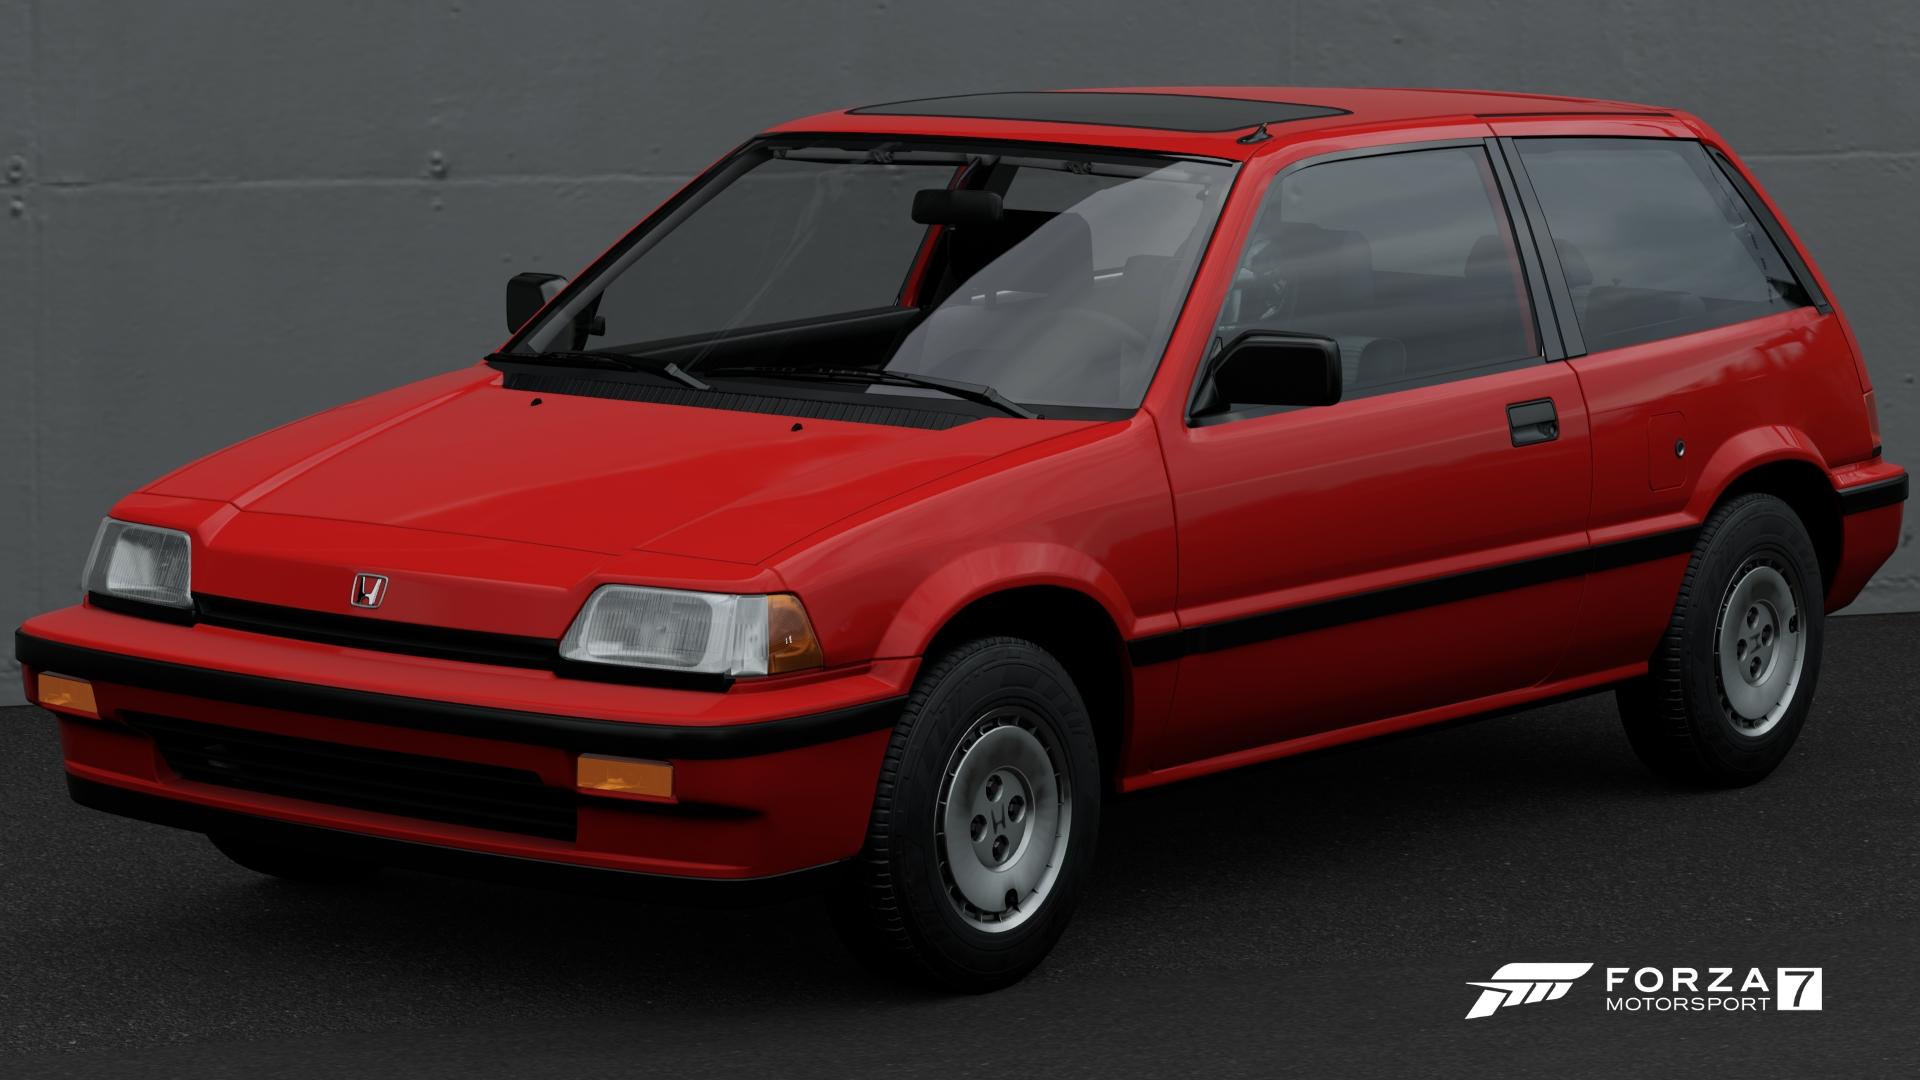 Honda Civic Si (1986) | Forza Motorsport Wiki | FANDOM powered by Wikia